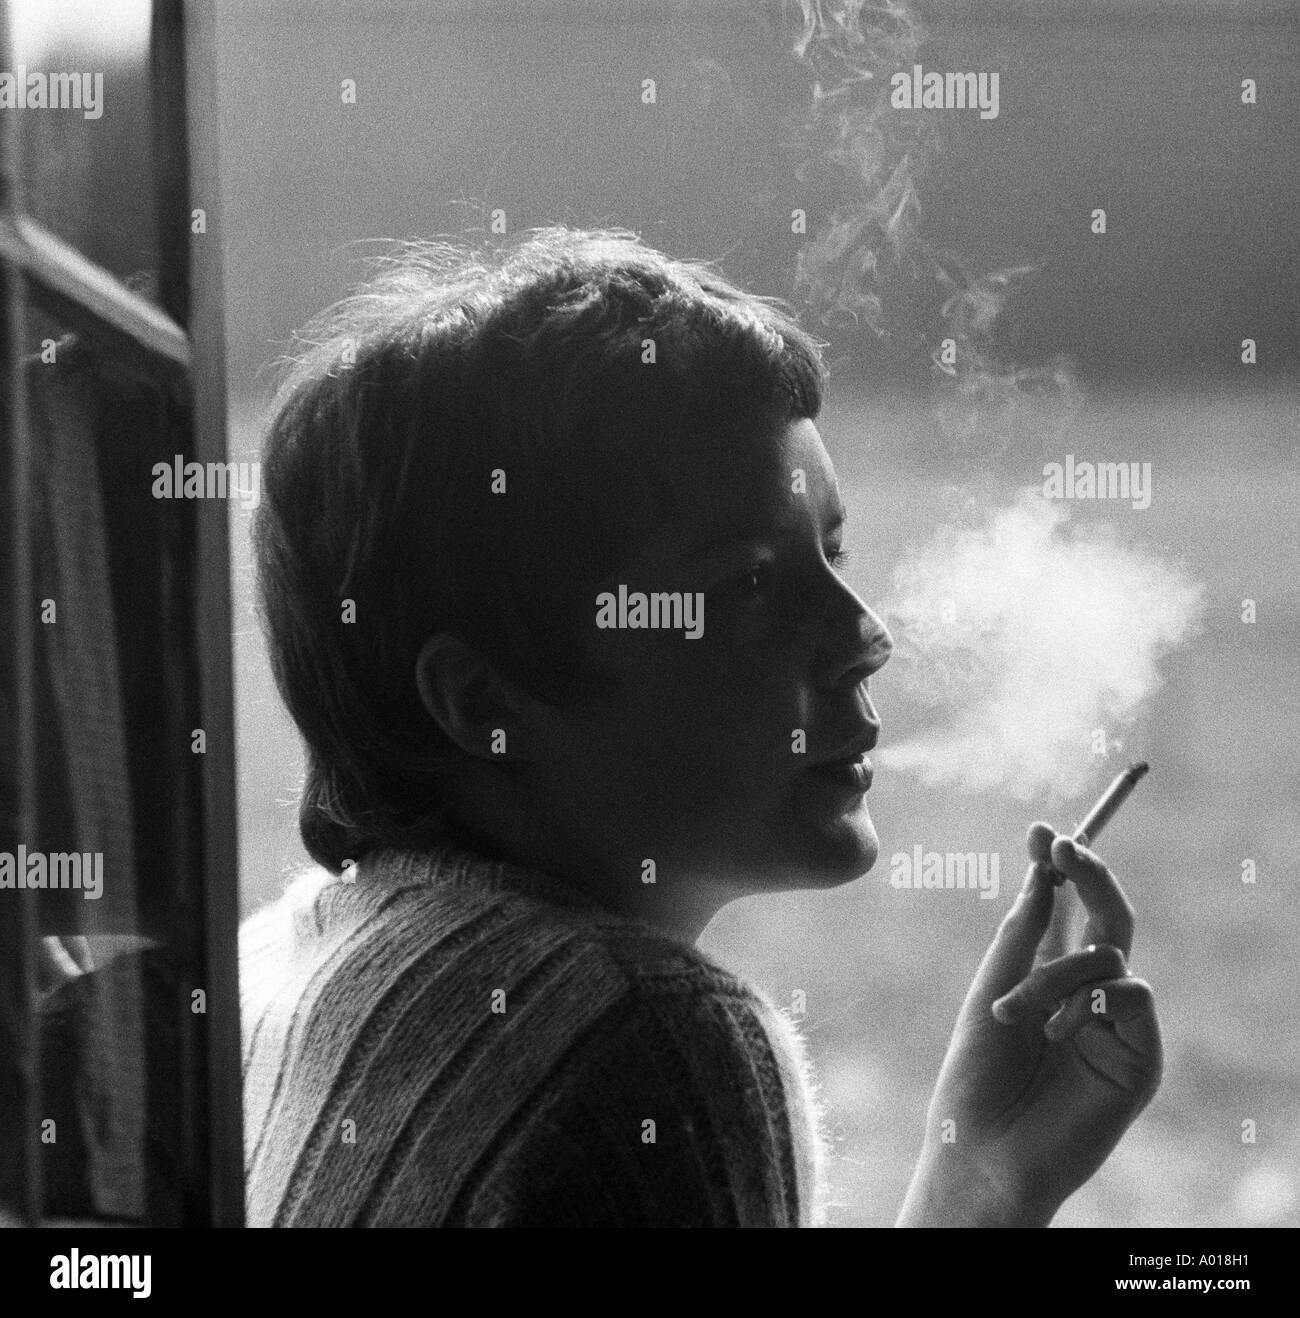 Health young girl young woman smoking a cigarette smoke back light